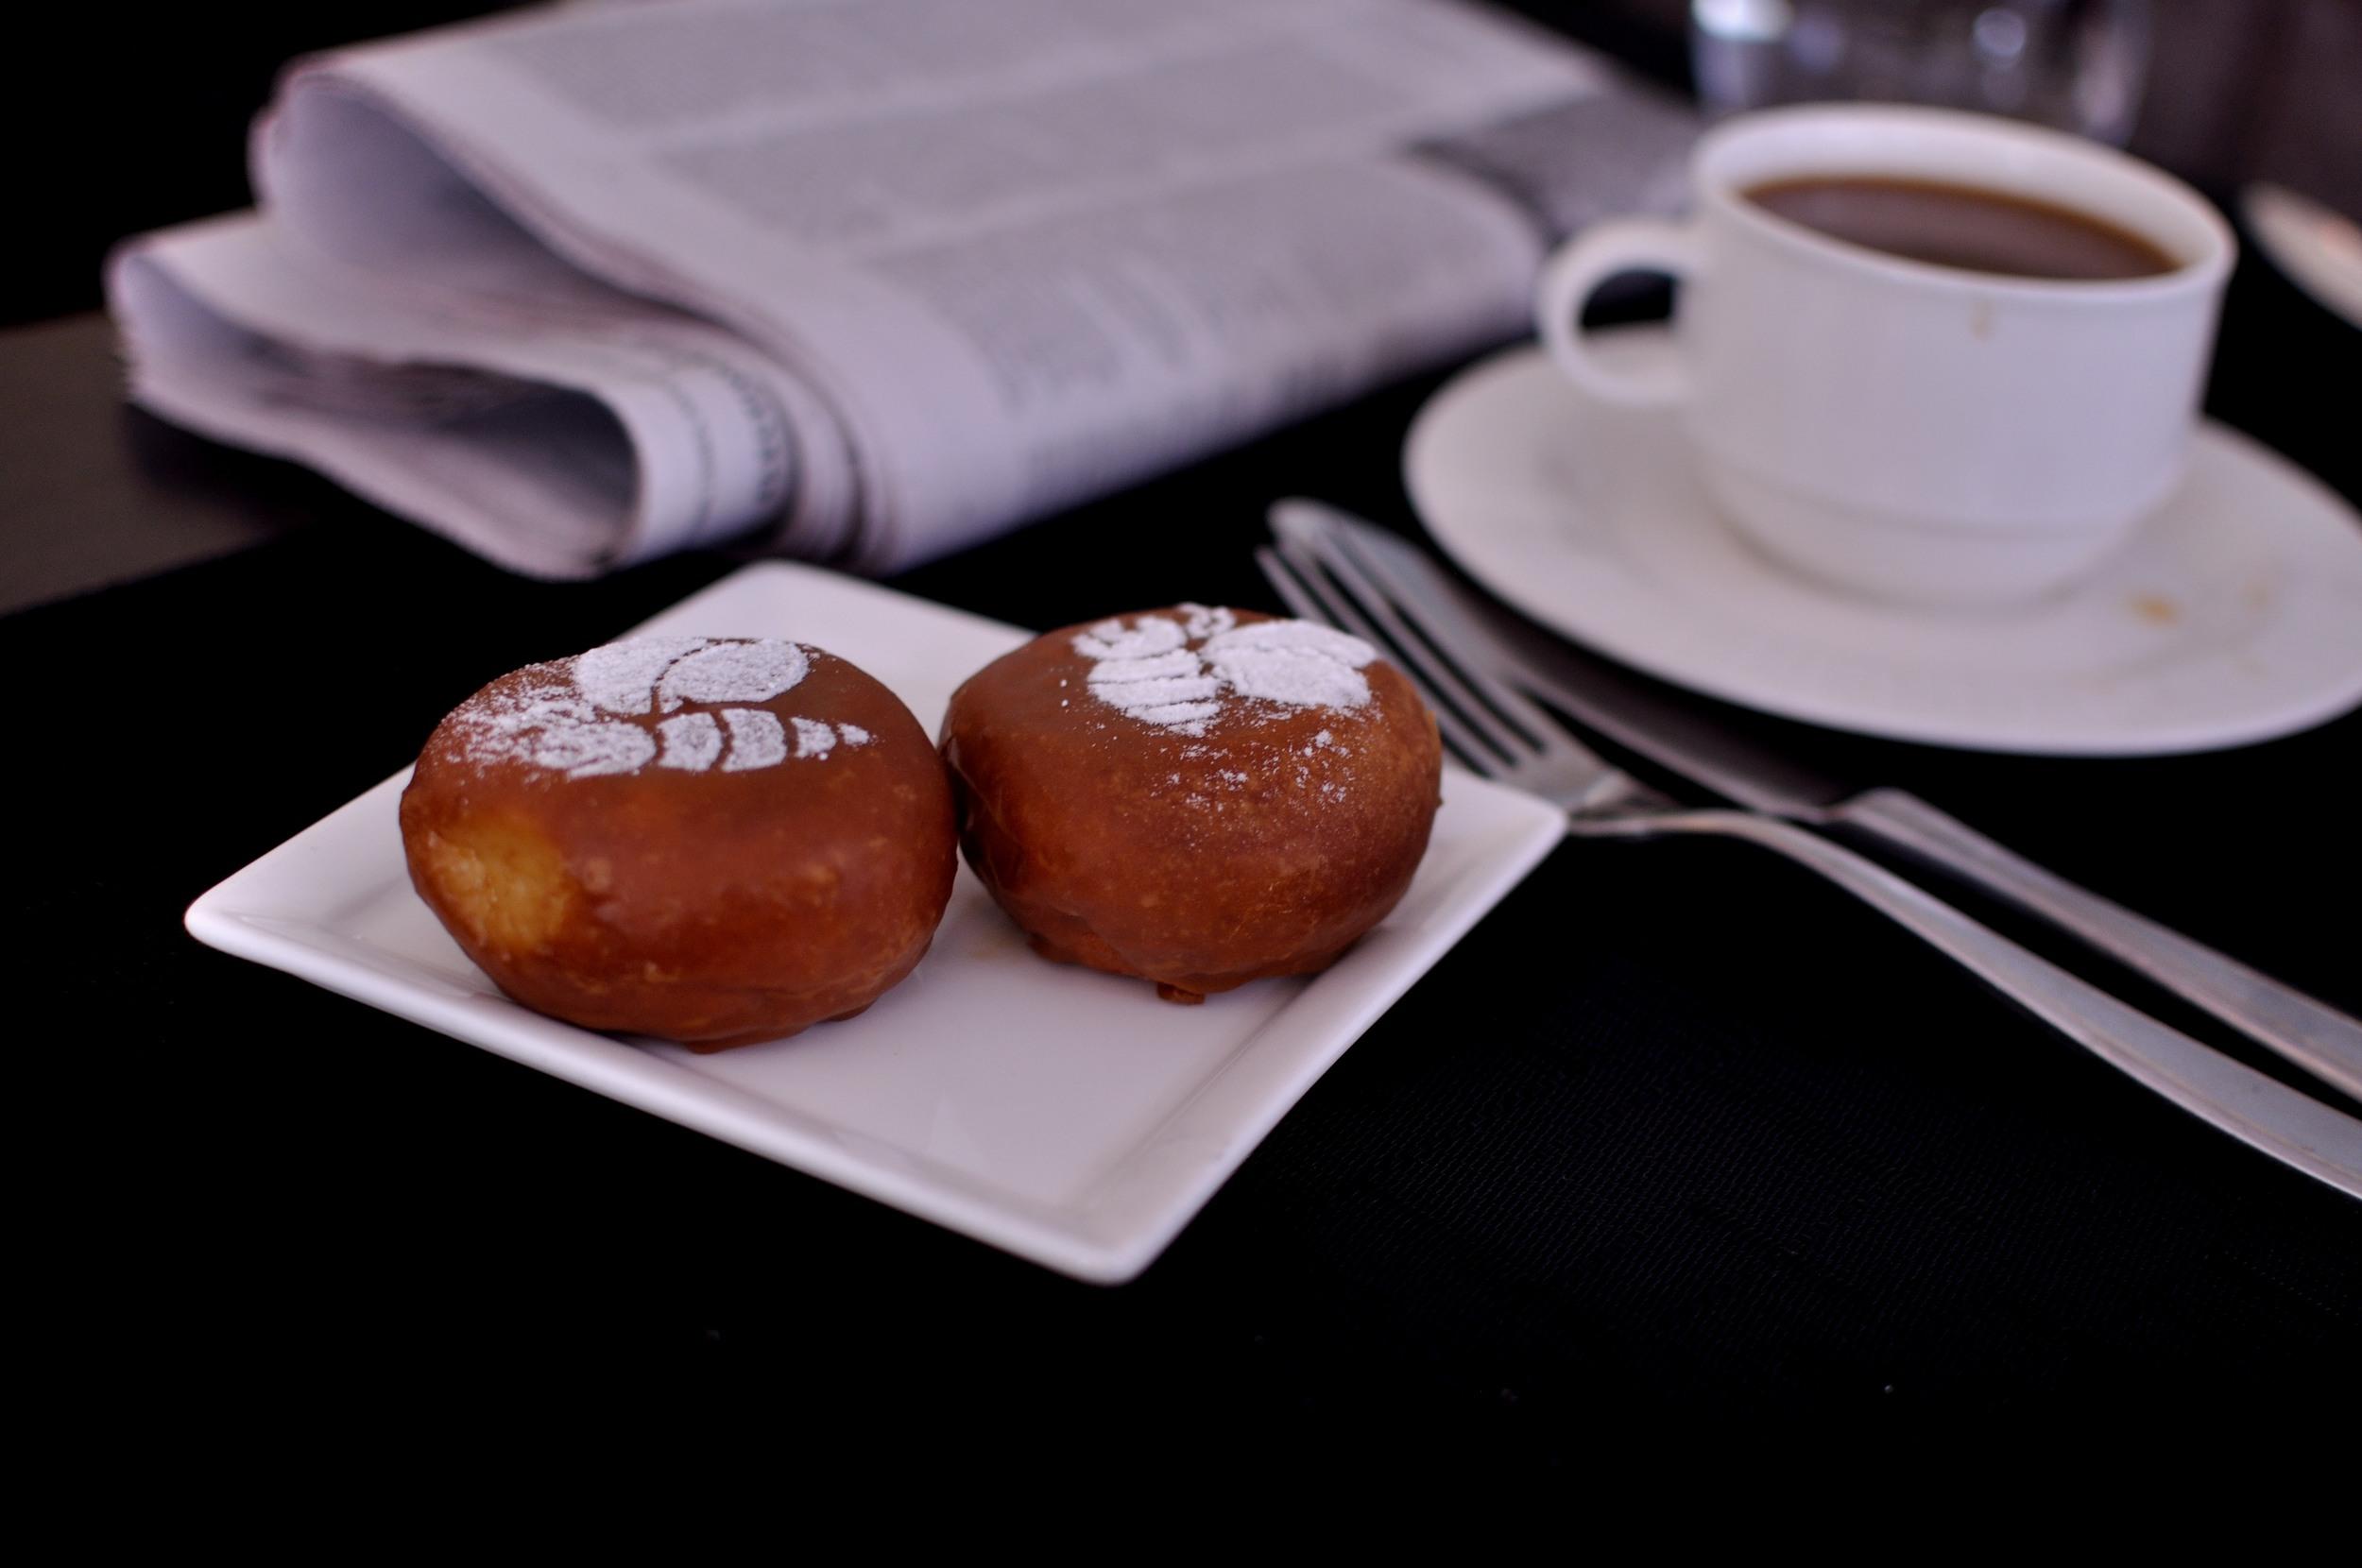 A Sweet Buzz At The Fairmont Washington 3 Ways To Try